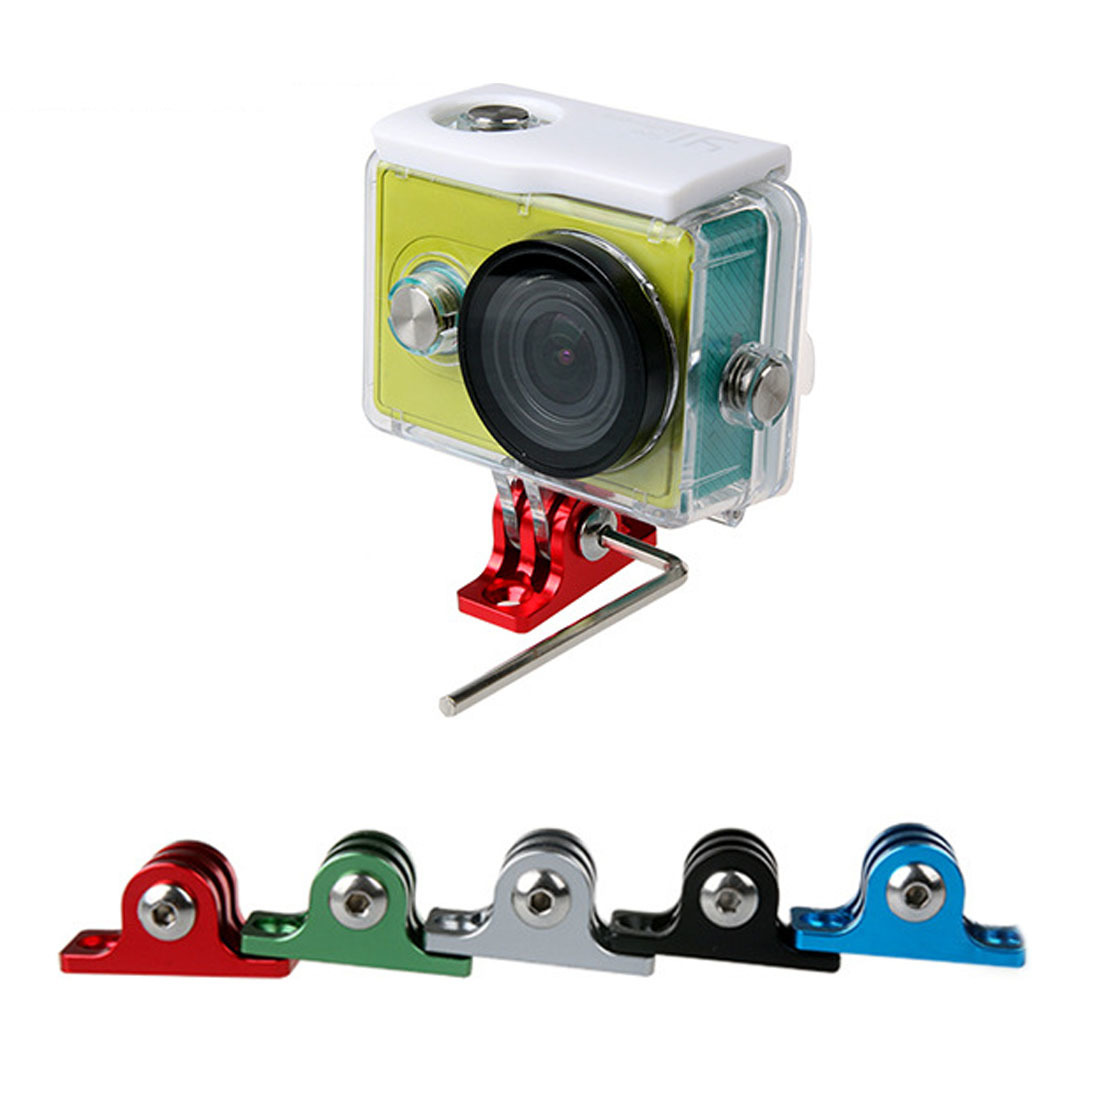 CNC Aluminum Alloy Tripod Adapter Mount for GoPro Hero 5 6 4 Session Xiaomi Yi 4K SJCAM SJ4000 SJ5000 h9 Go Pro Mount Accessory